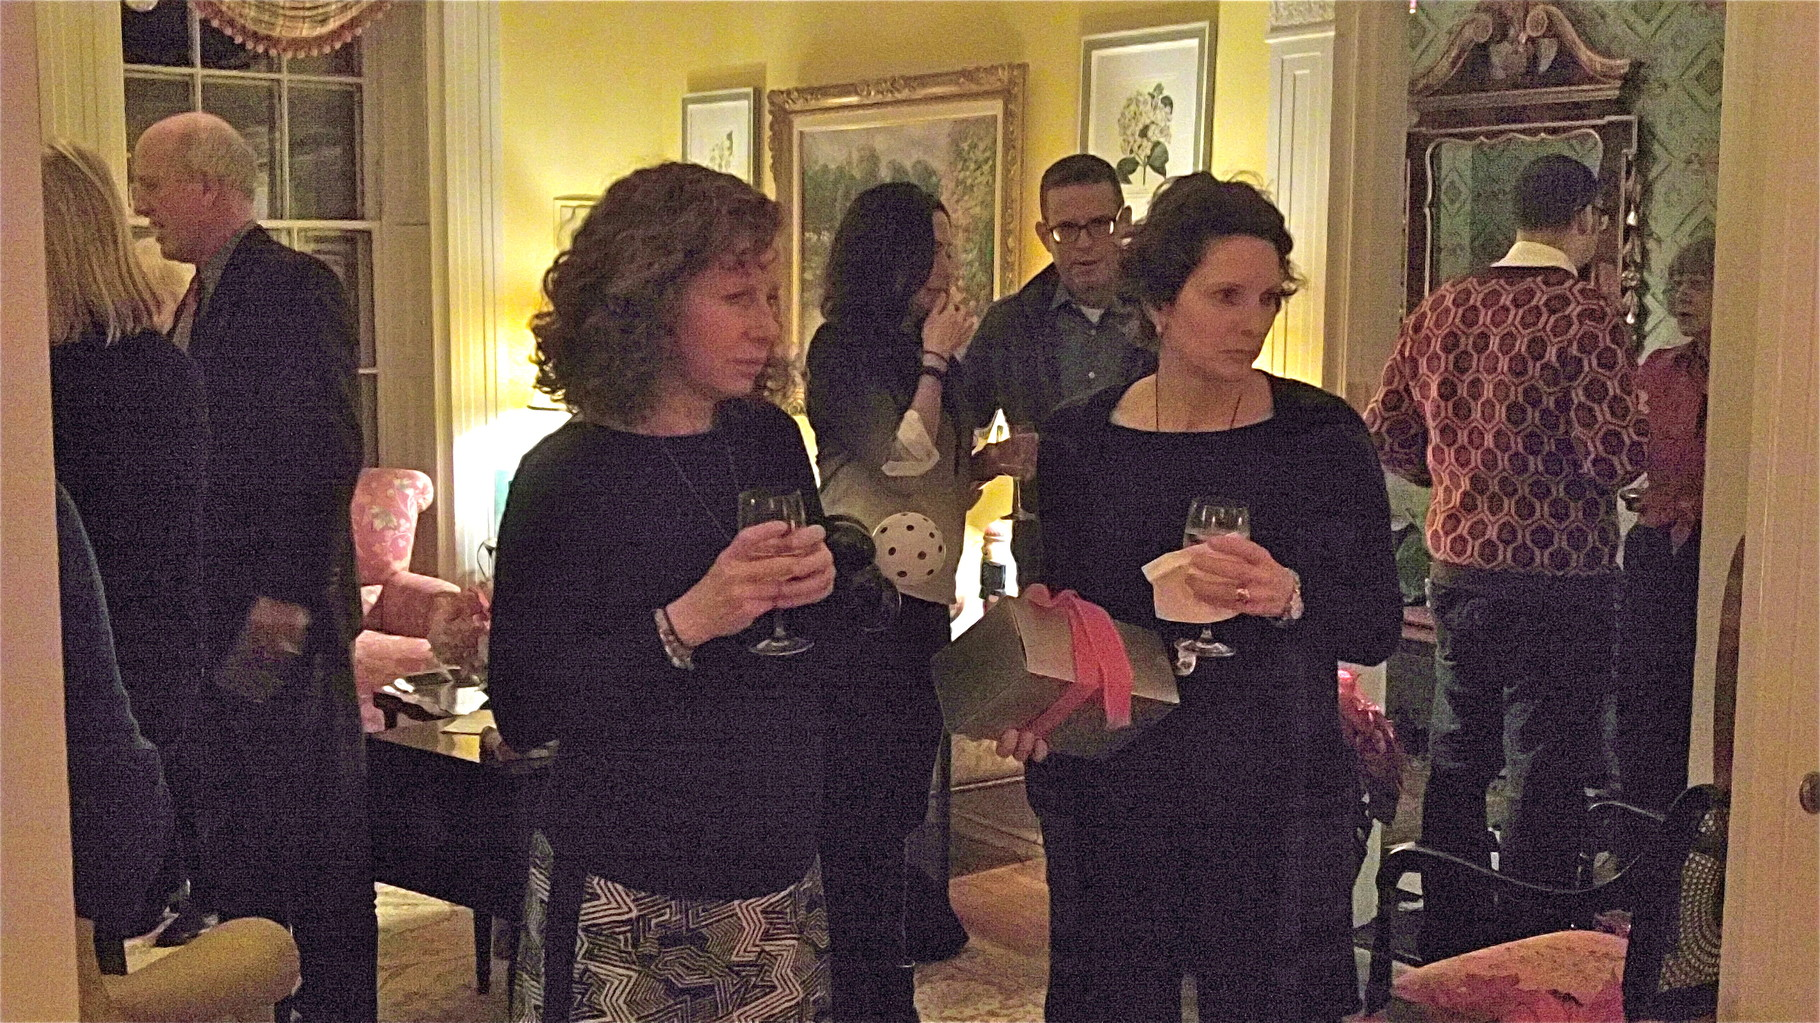 Julie & Lisa Kagel look on